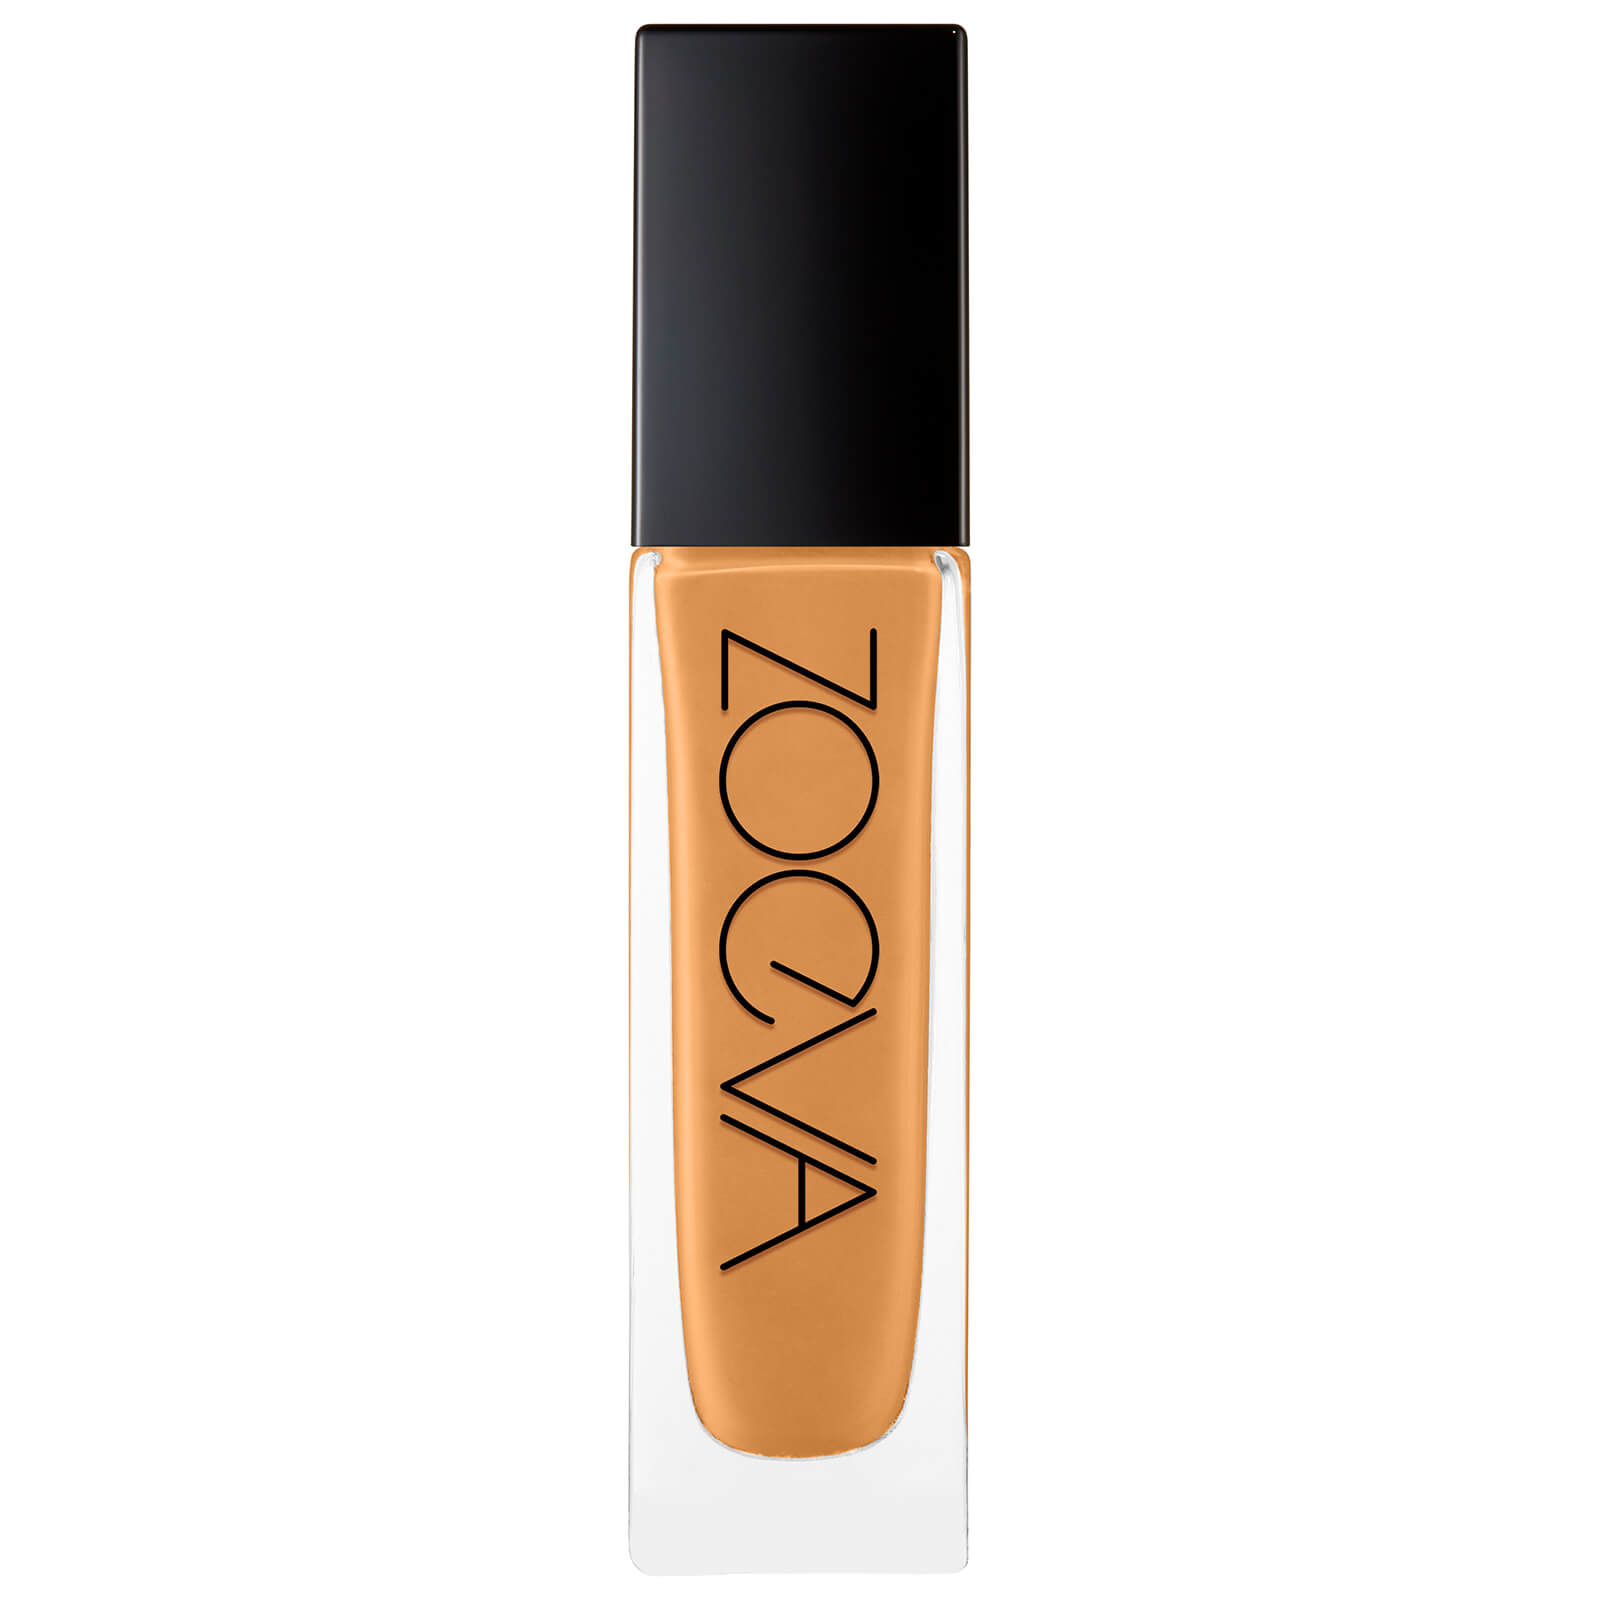 ZOEVA Authentik Skin Foundation 30ml (Various Shades) - 260W Harmony